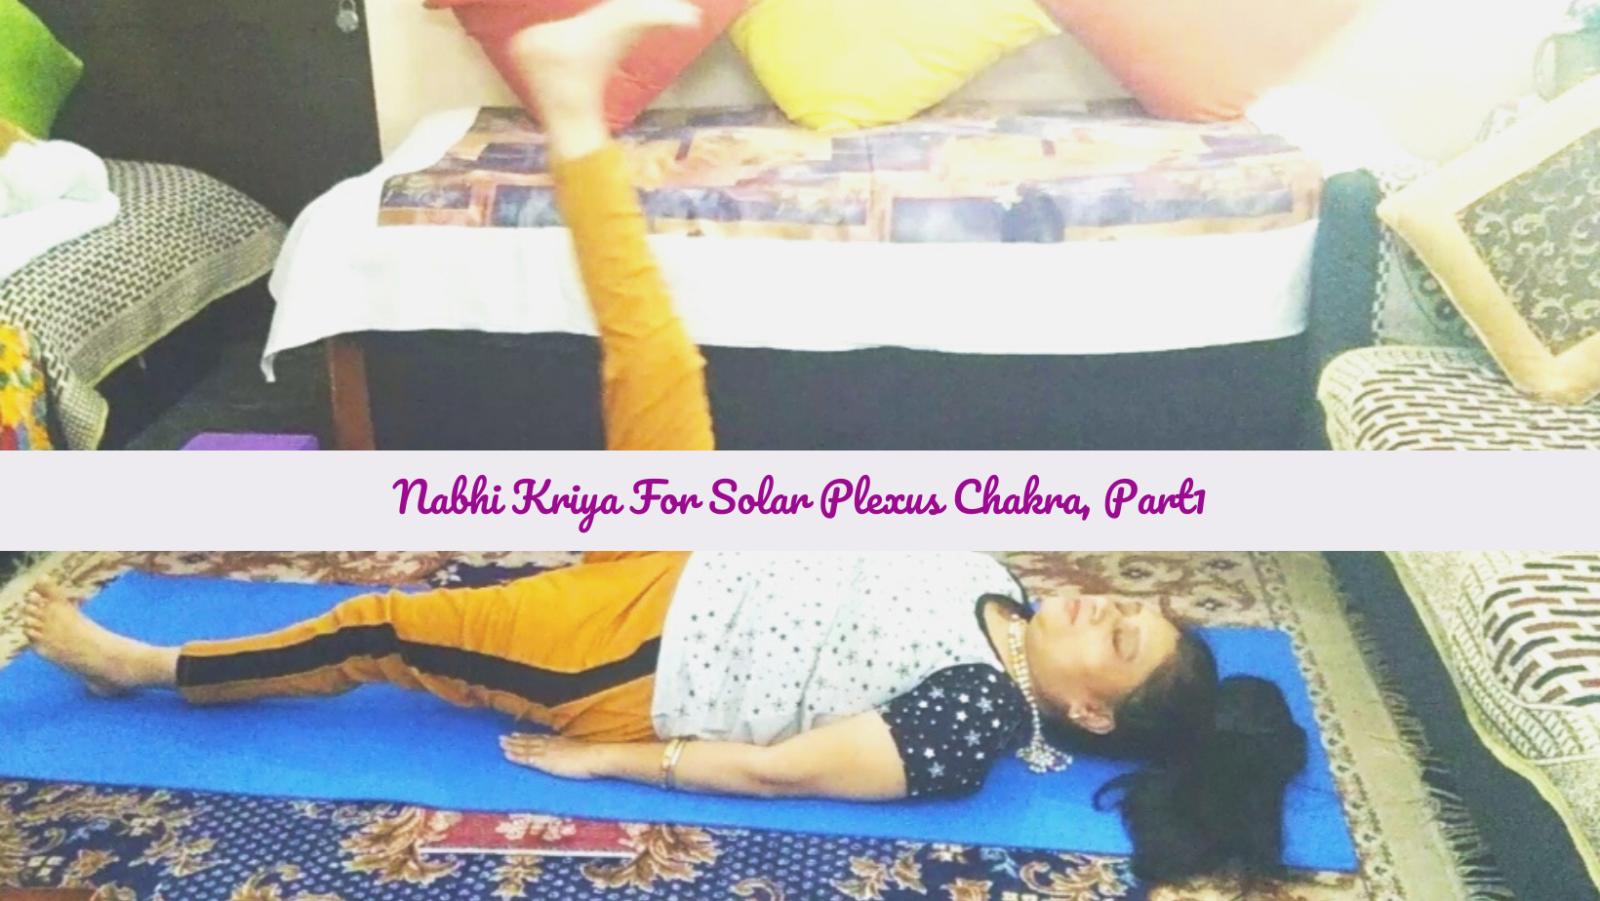 Featured image for Nabhi Kriya To Unblock Your Solar Plexus Chakra, Nabhi Kriya For Courage, Confidence, And Power